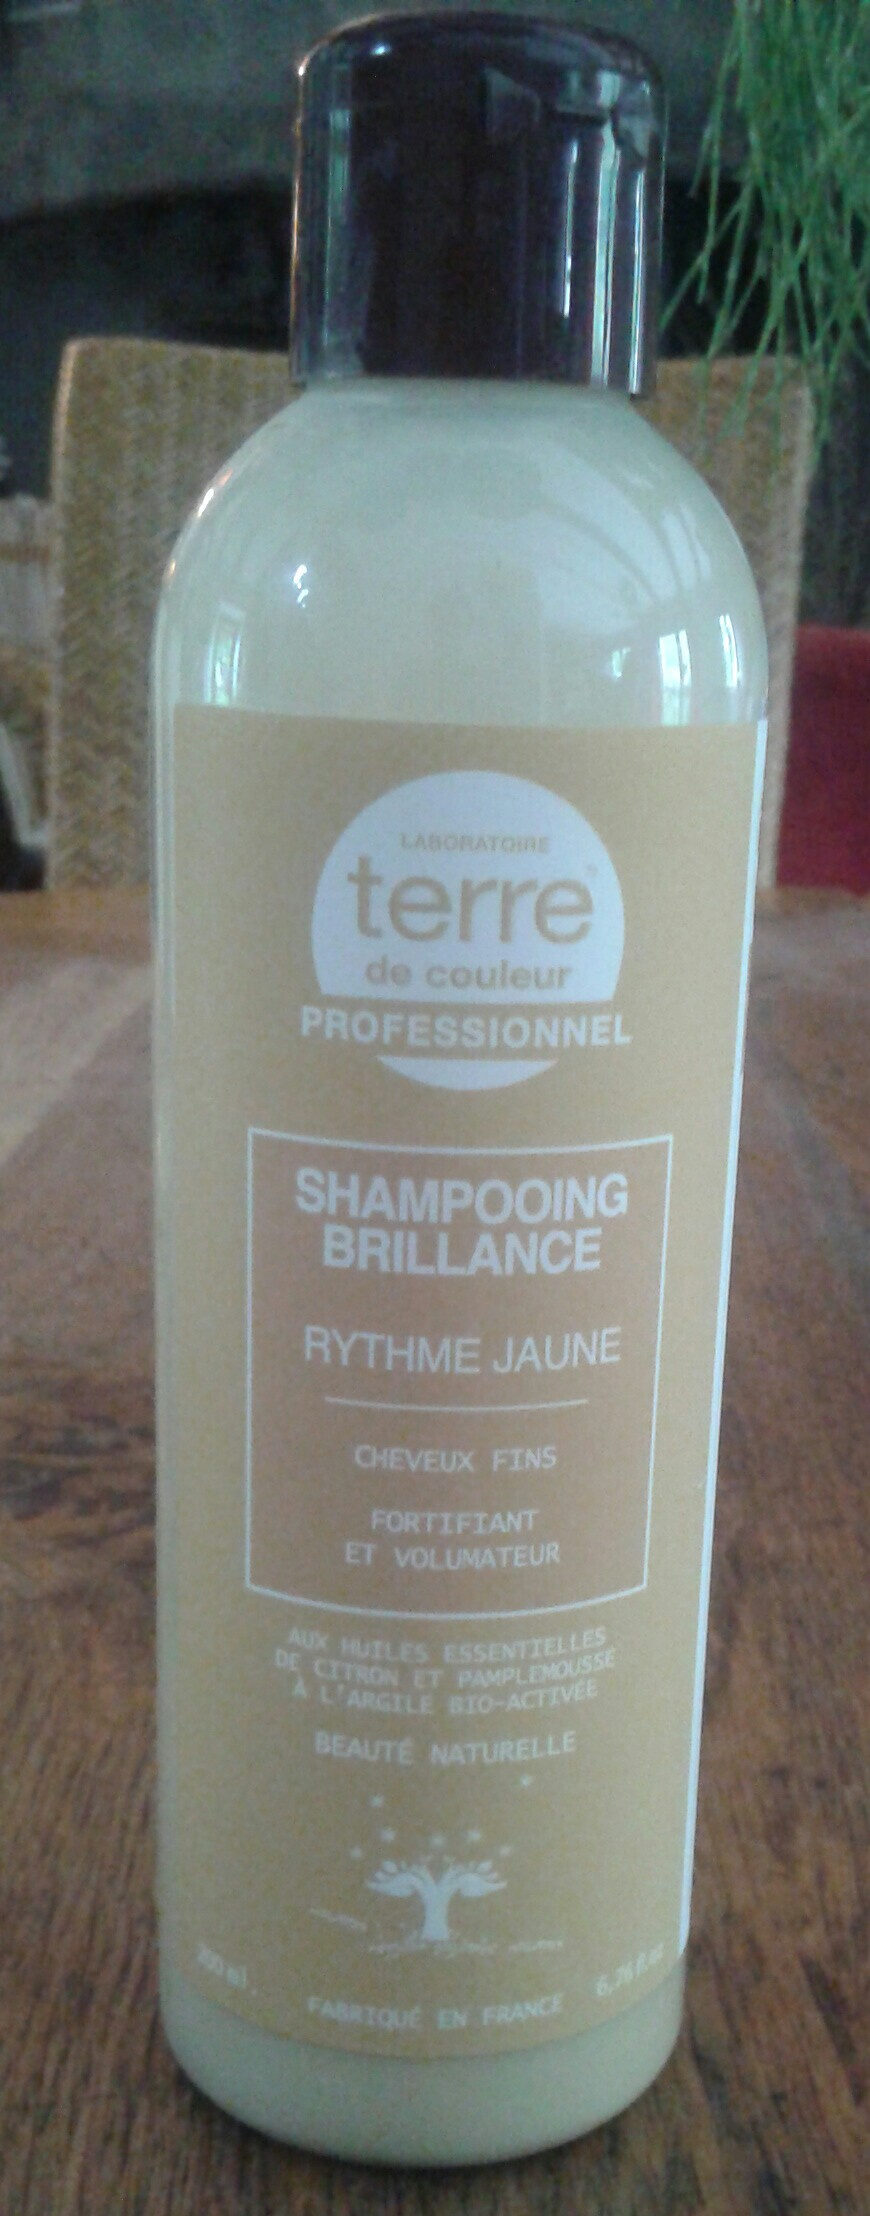 shampooing brillance - Produit - fr